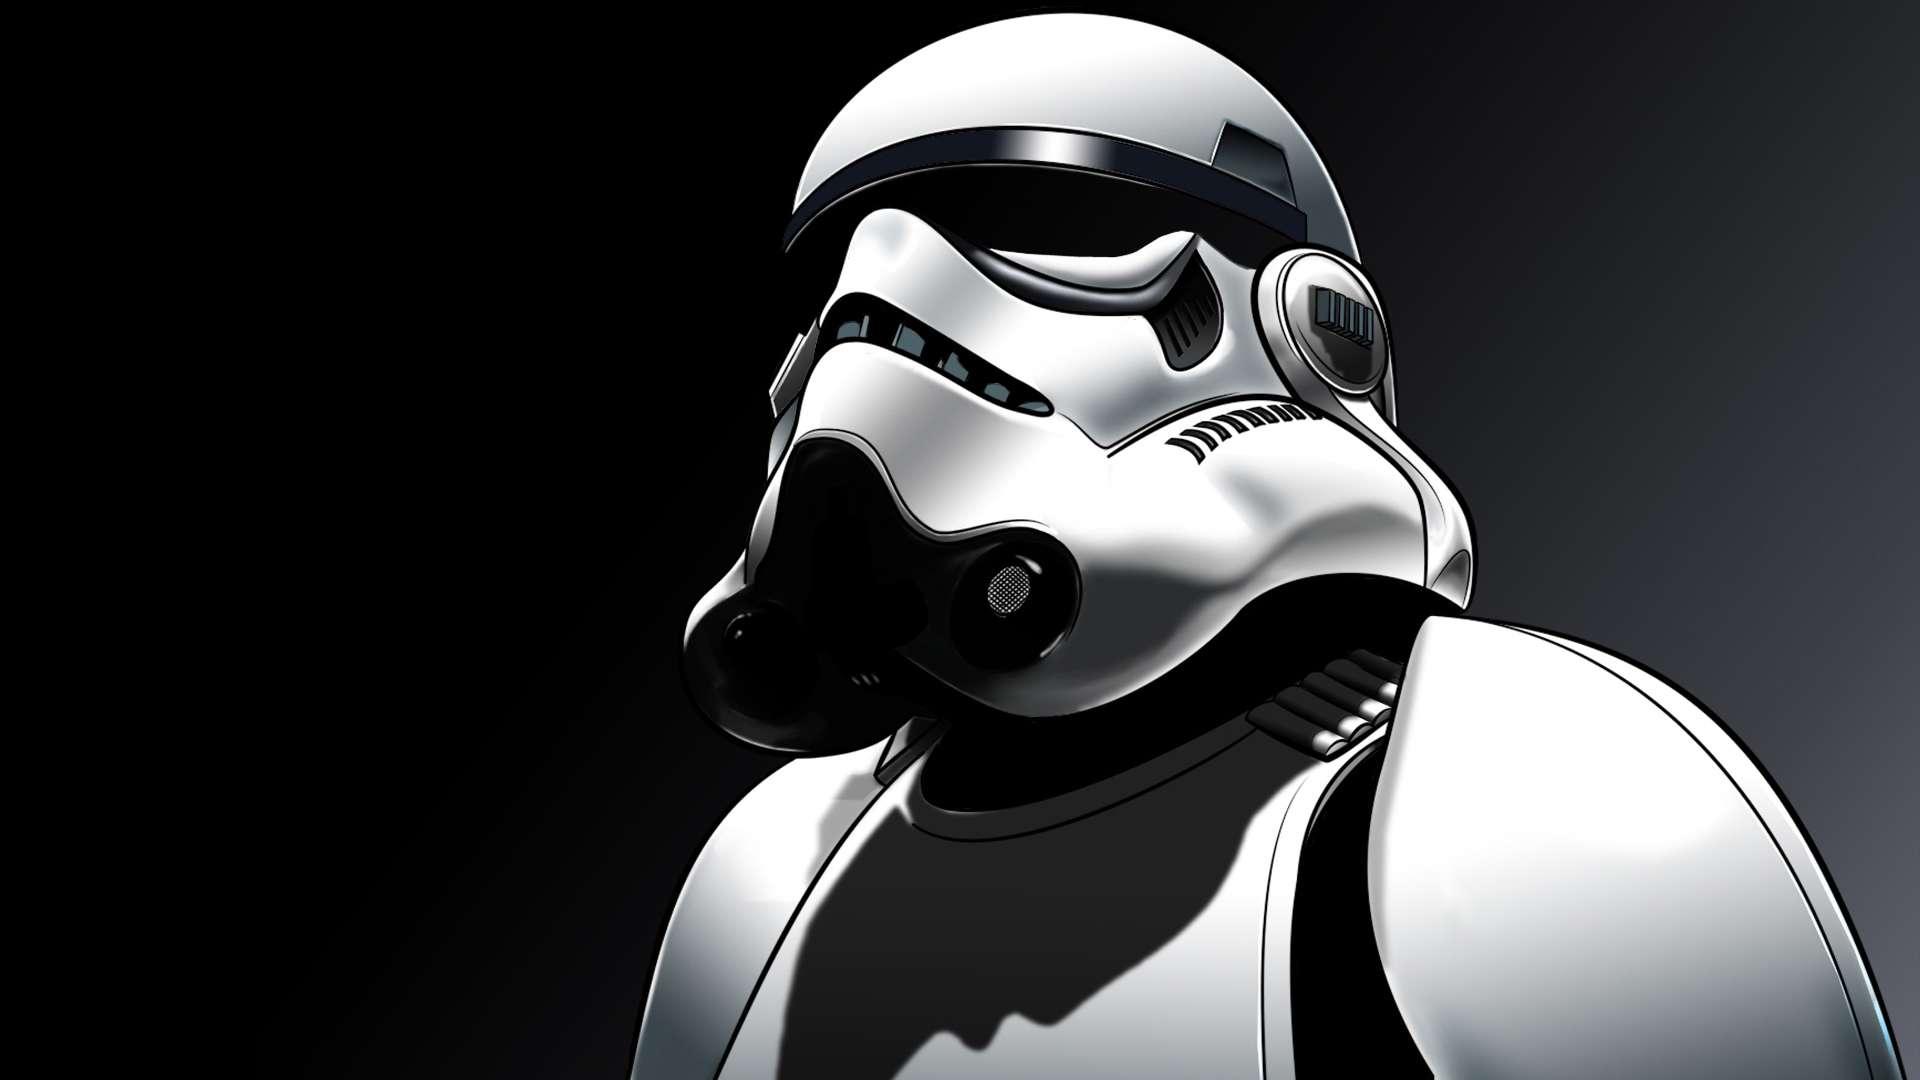 Star Wars Wallpaper 195